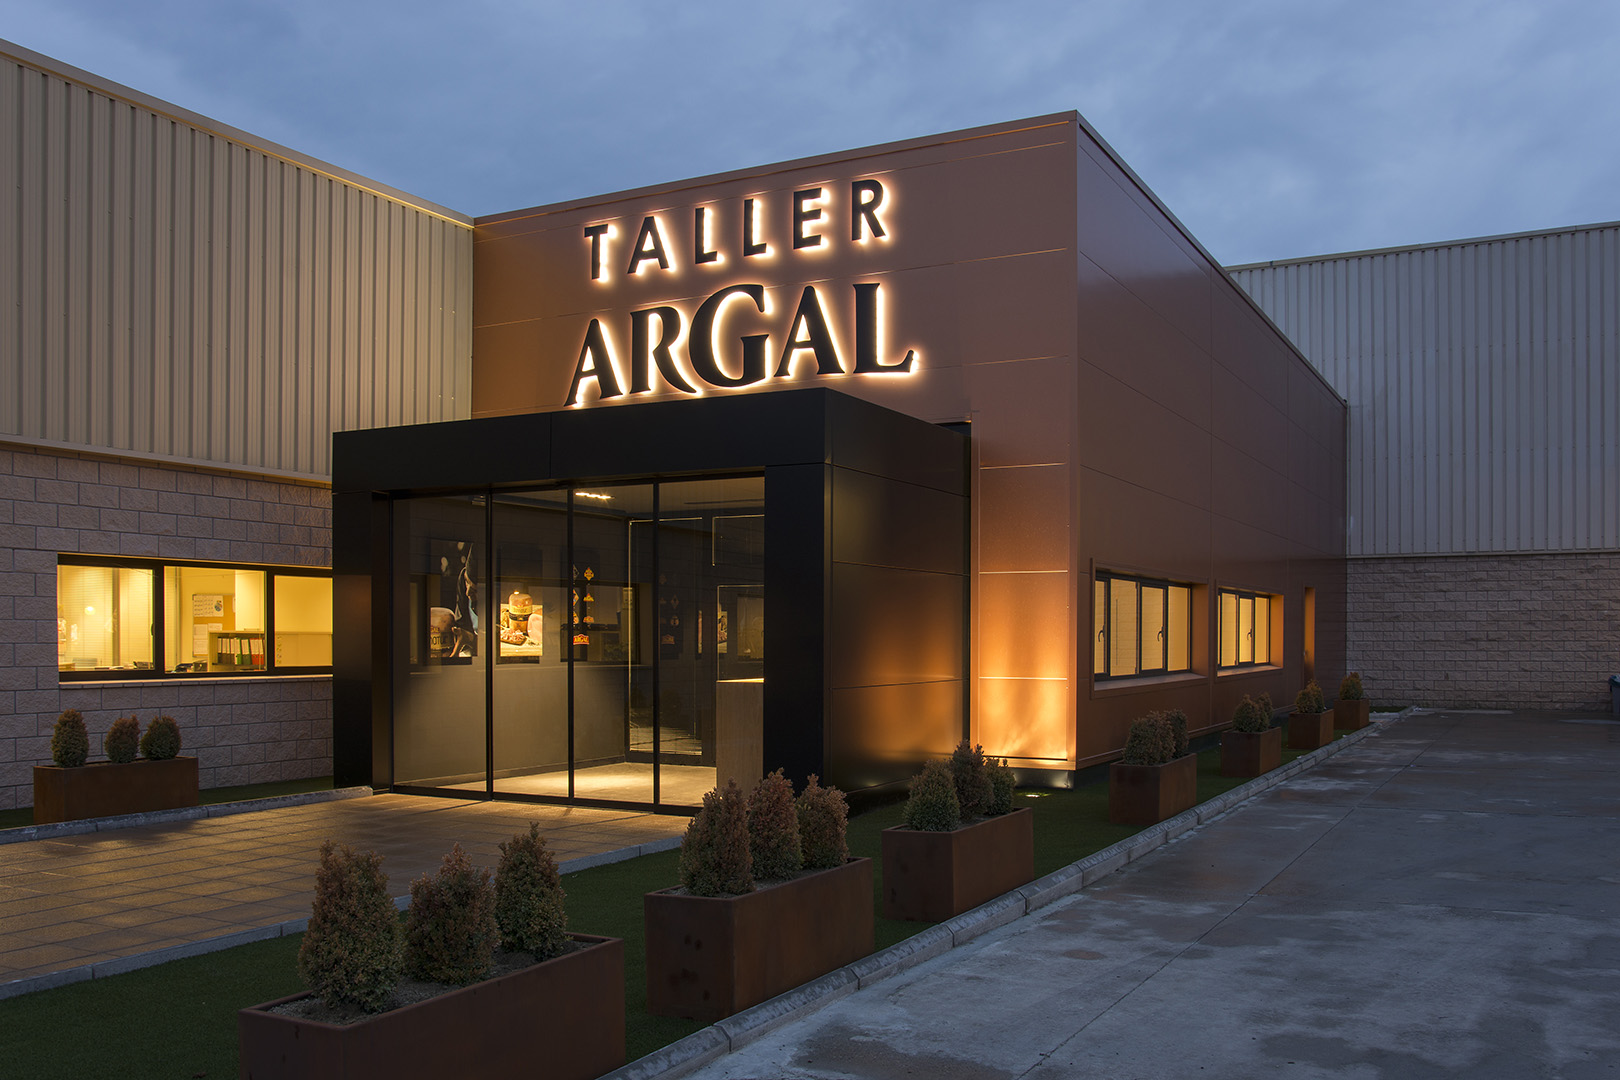 Taller-Argal_foto-8